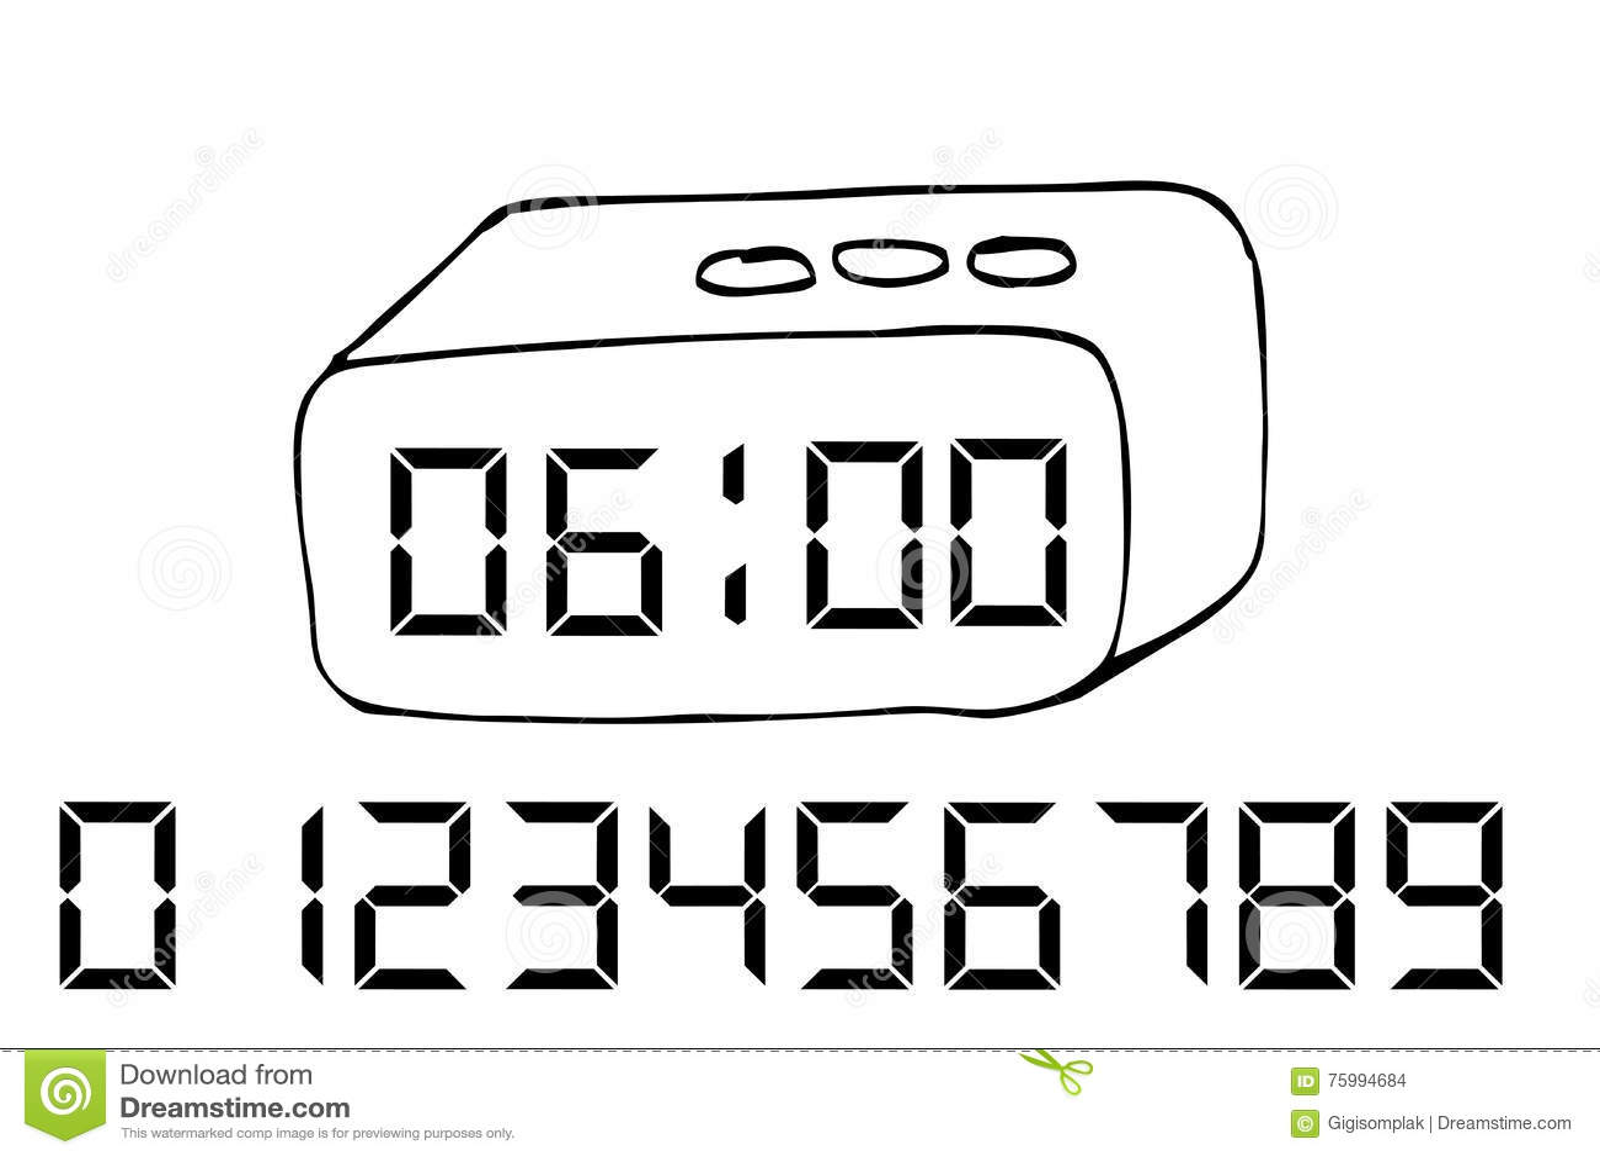 Hand Draw Sketch Of Digital Alarm Clock Stock Vector